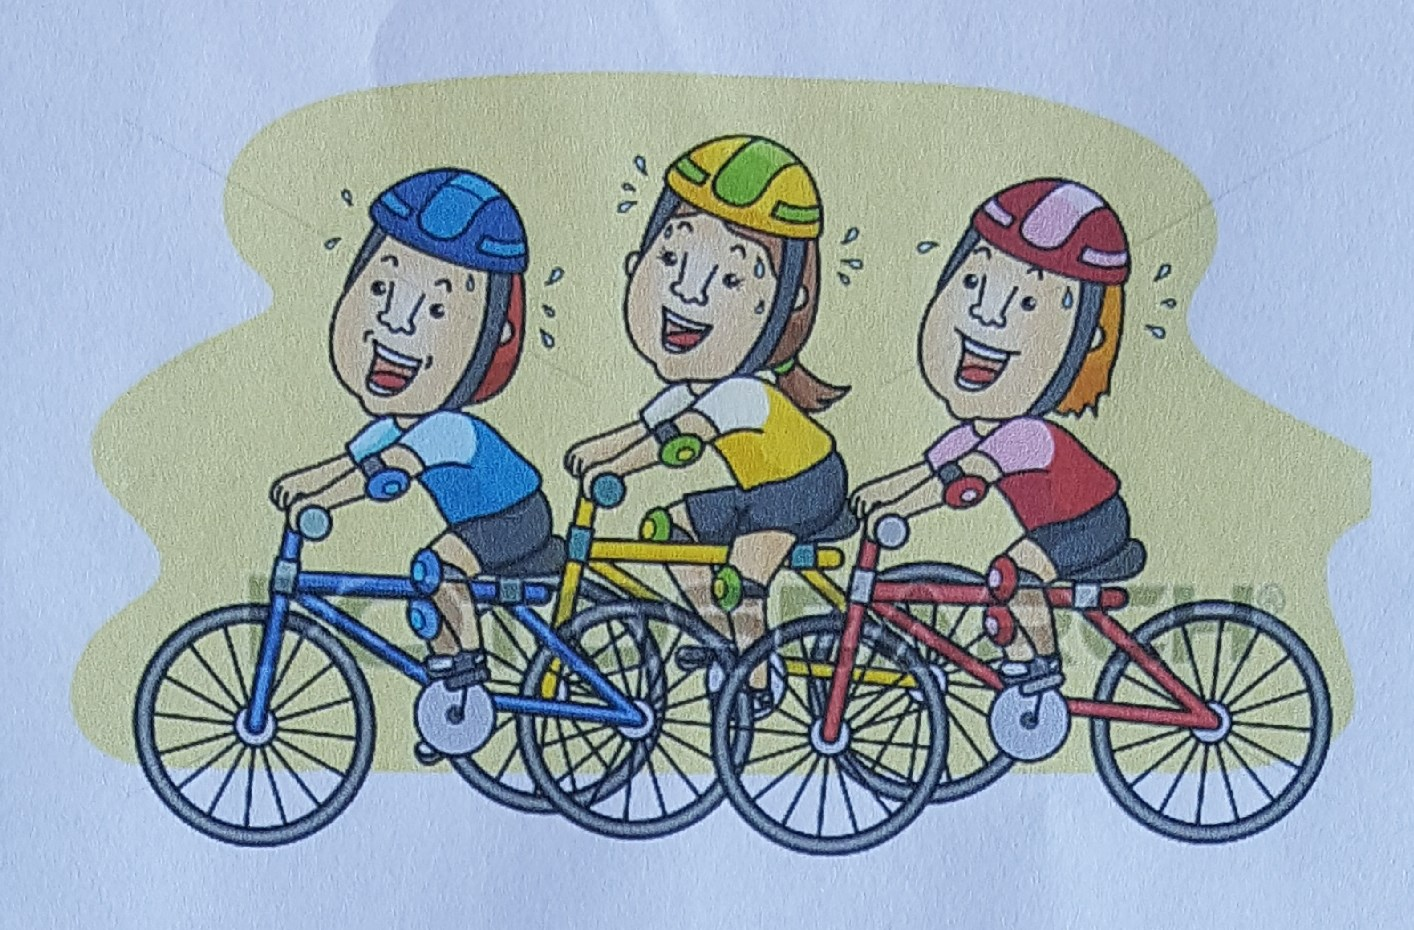 3 små cyklister.